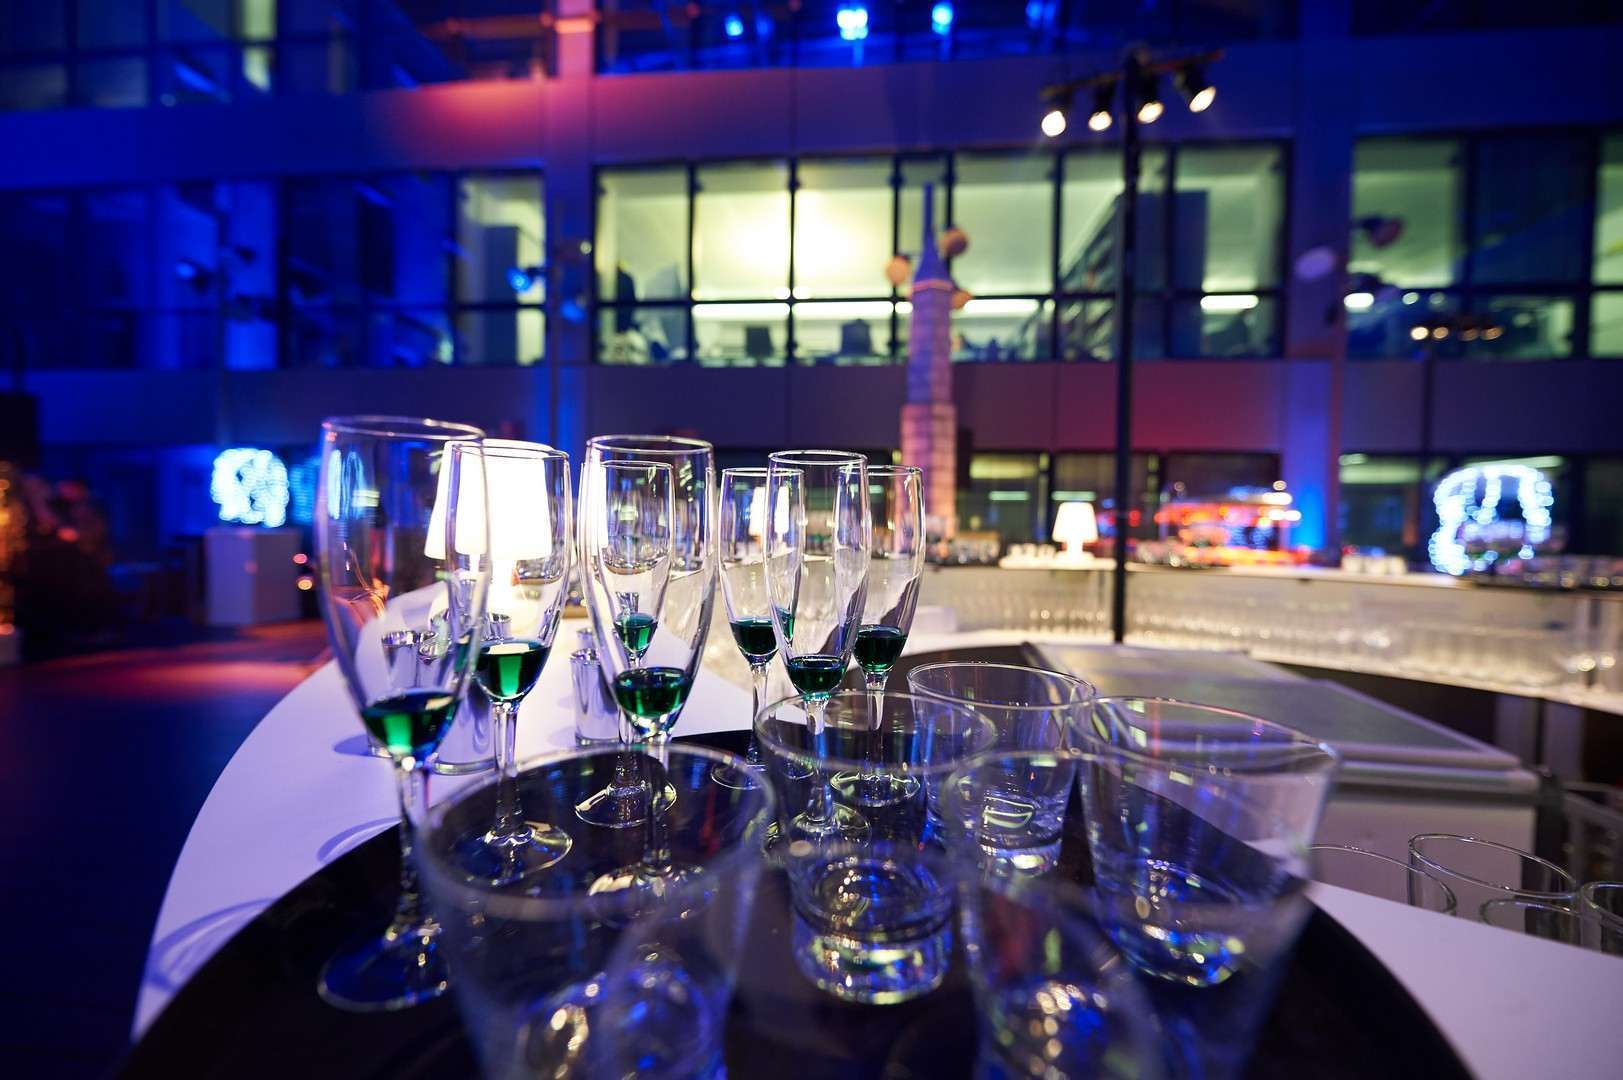 xmas-degroof-petercam-2016-luxembourg-events